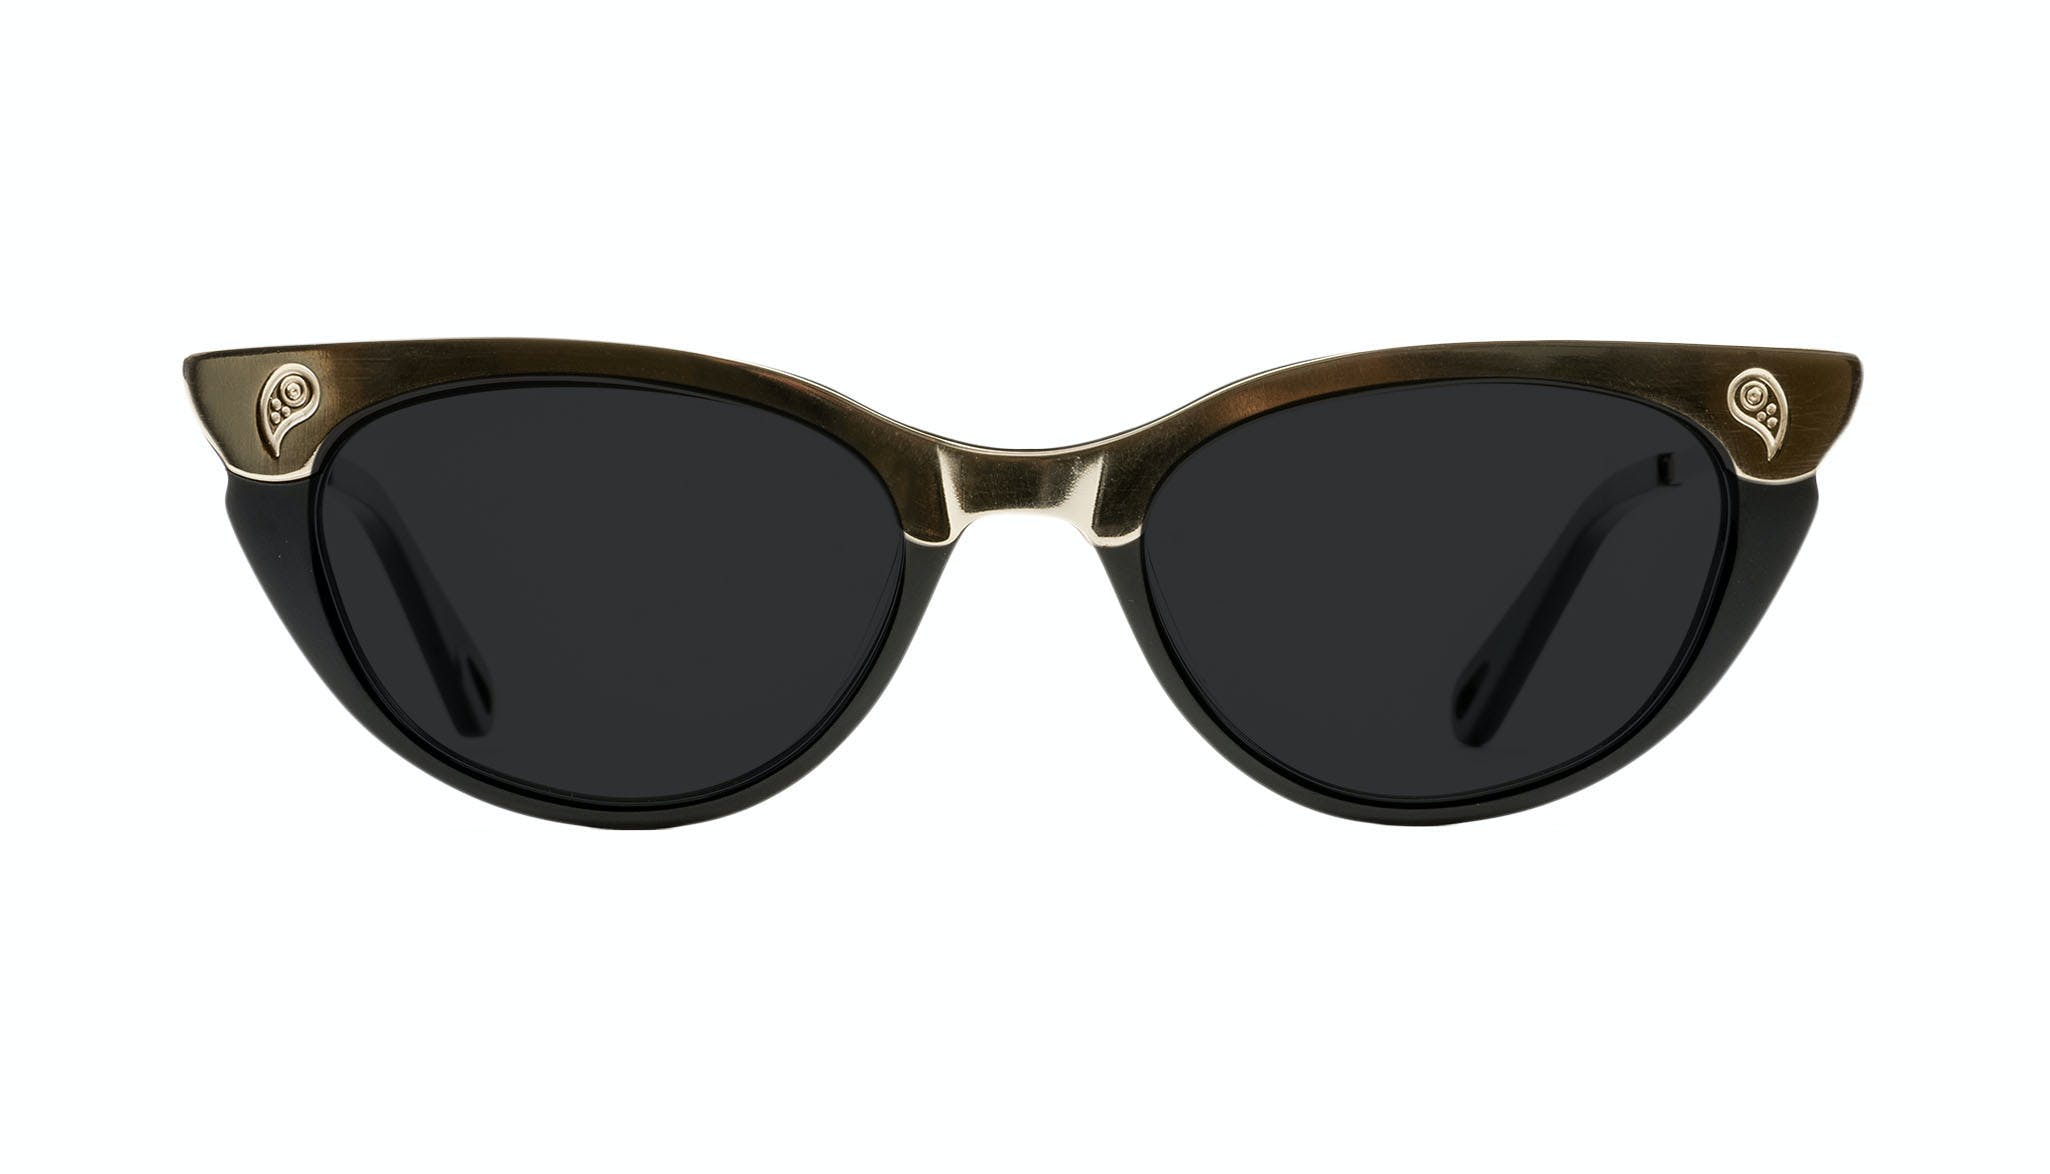 Affordable Fashion Glasses Cat Eye Daring Cateye Sunglasses Women Bad Beti Mumtaz Front